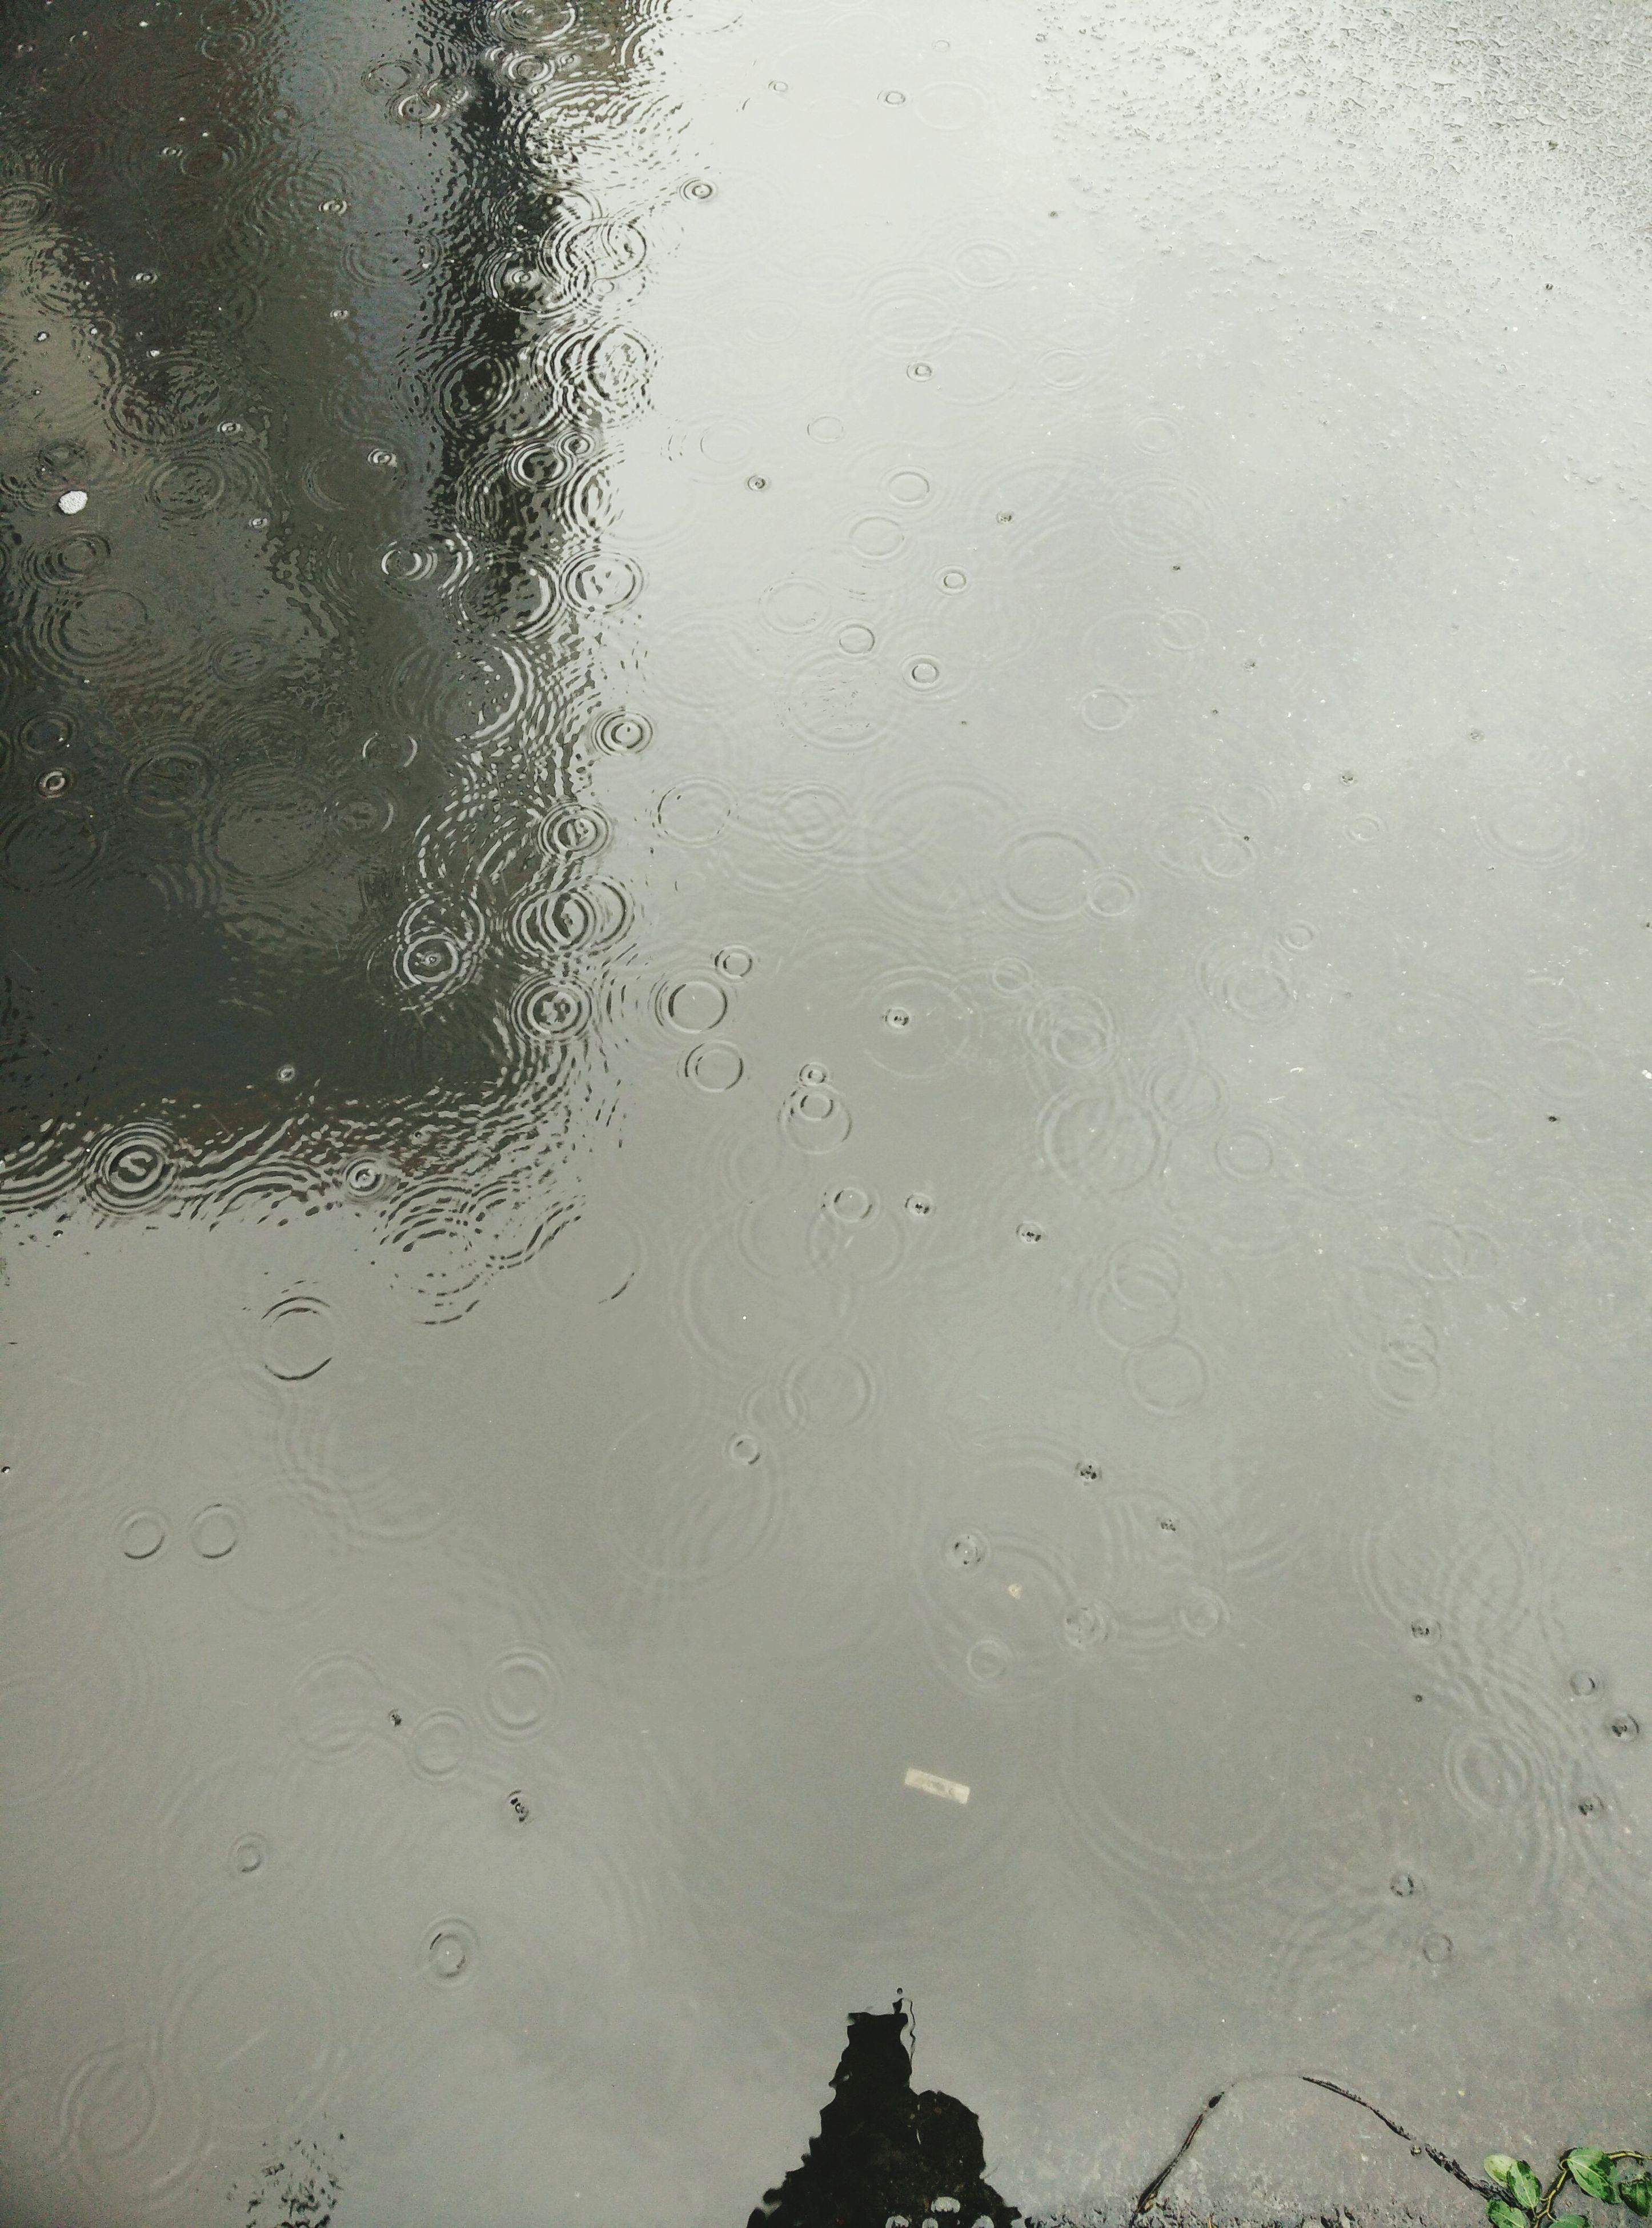 wet, water, drop, window, rain, sky, weather, transparent, glass - material, raindrop, indoors, full frame, cloud - sky, backgrounds, season, nature, dusk, no people, glass, overcast